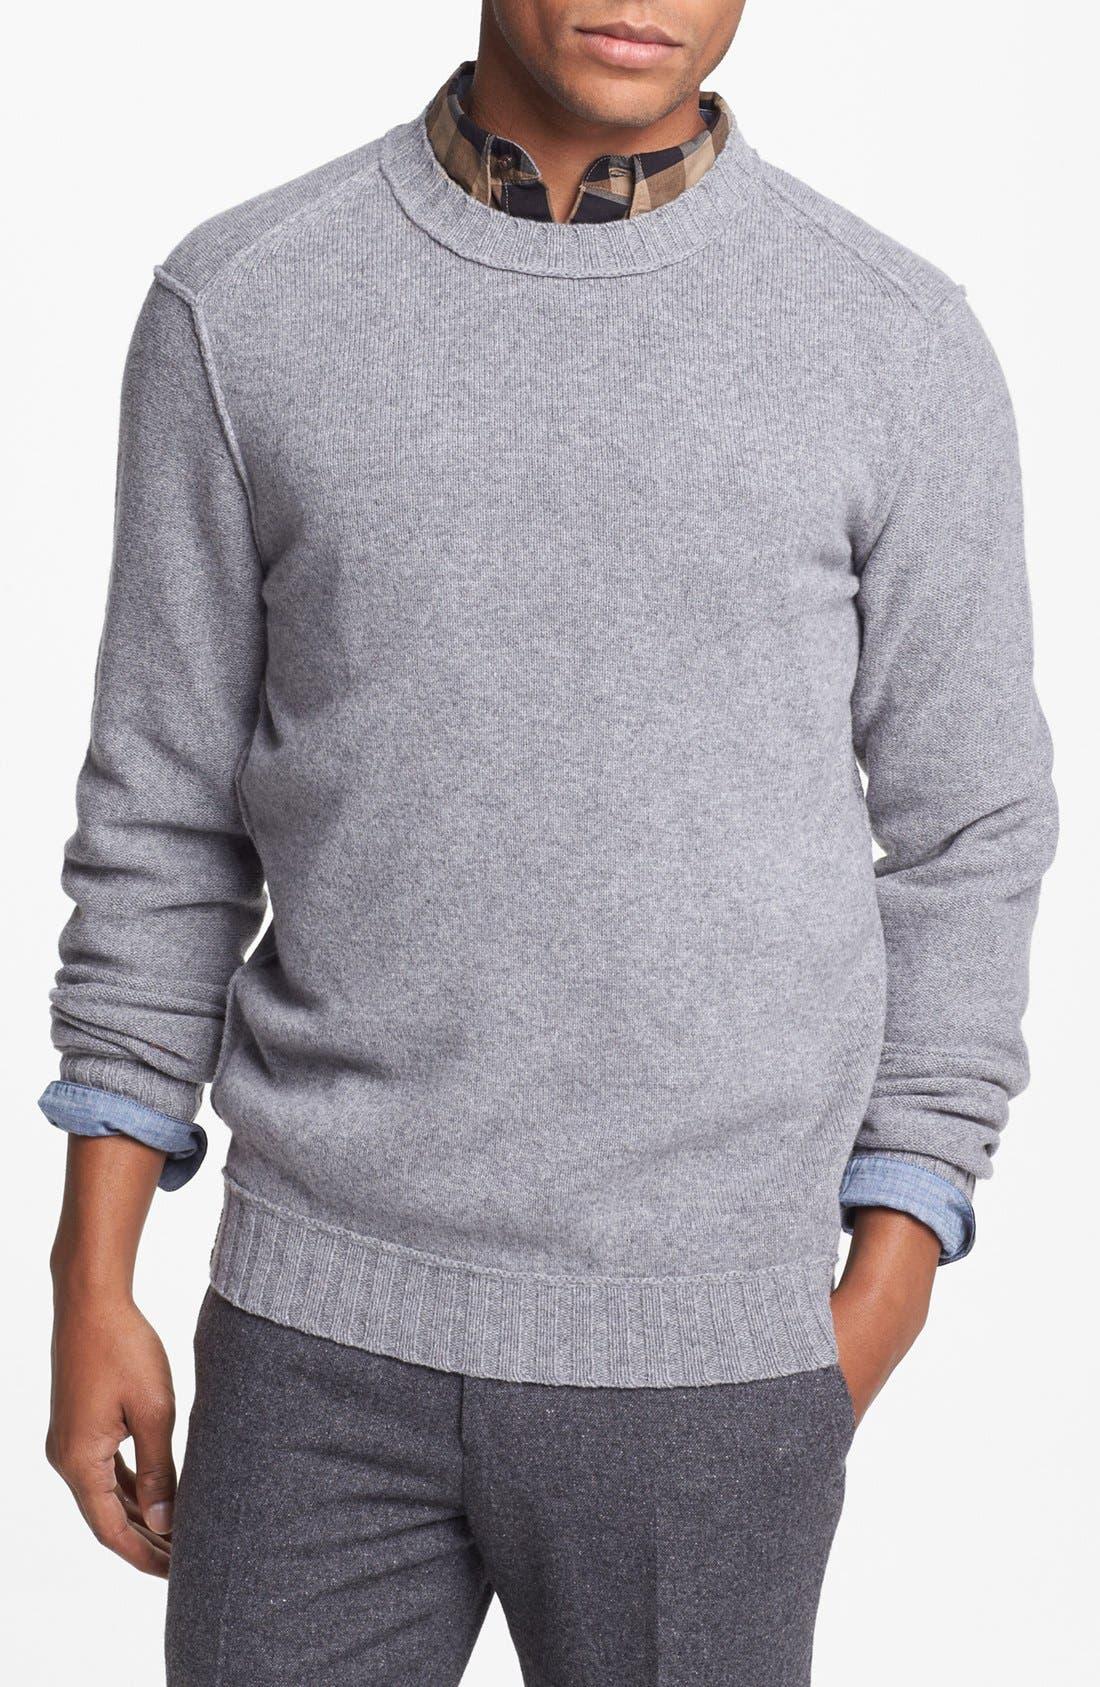 Alternate Image 1 Selected - BOSS Orange 'Adwin' Crewneck Sweater